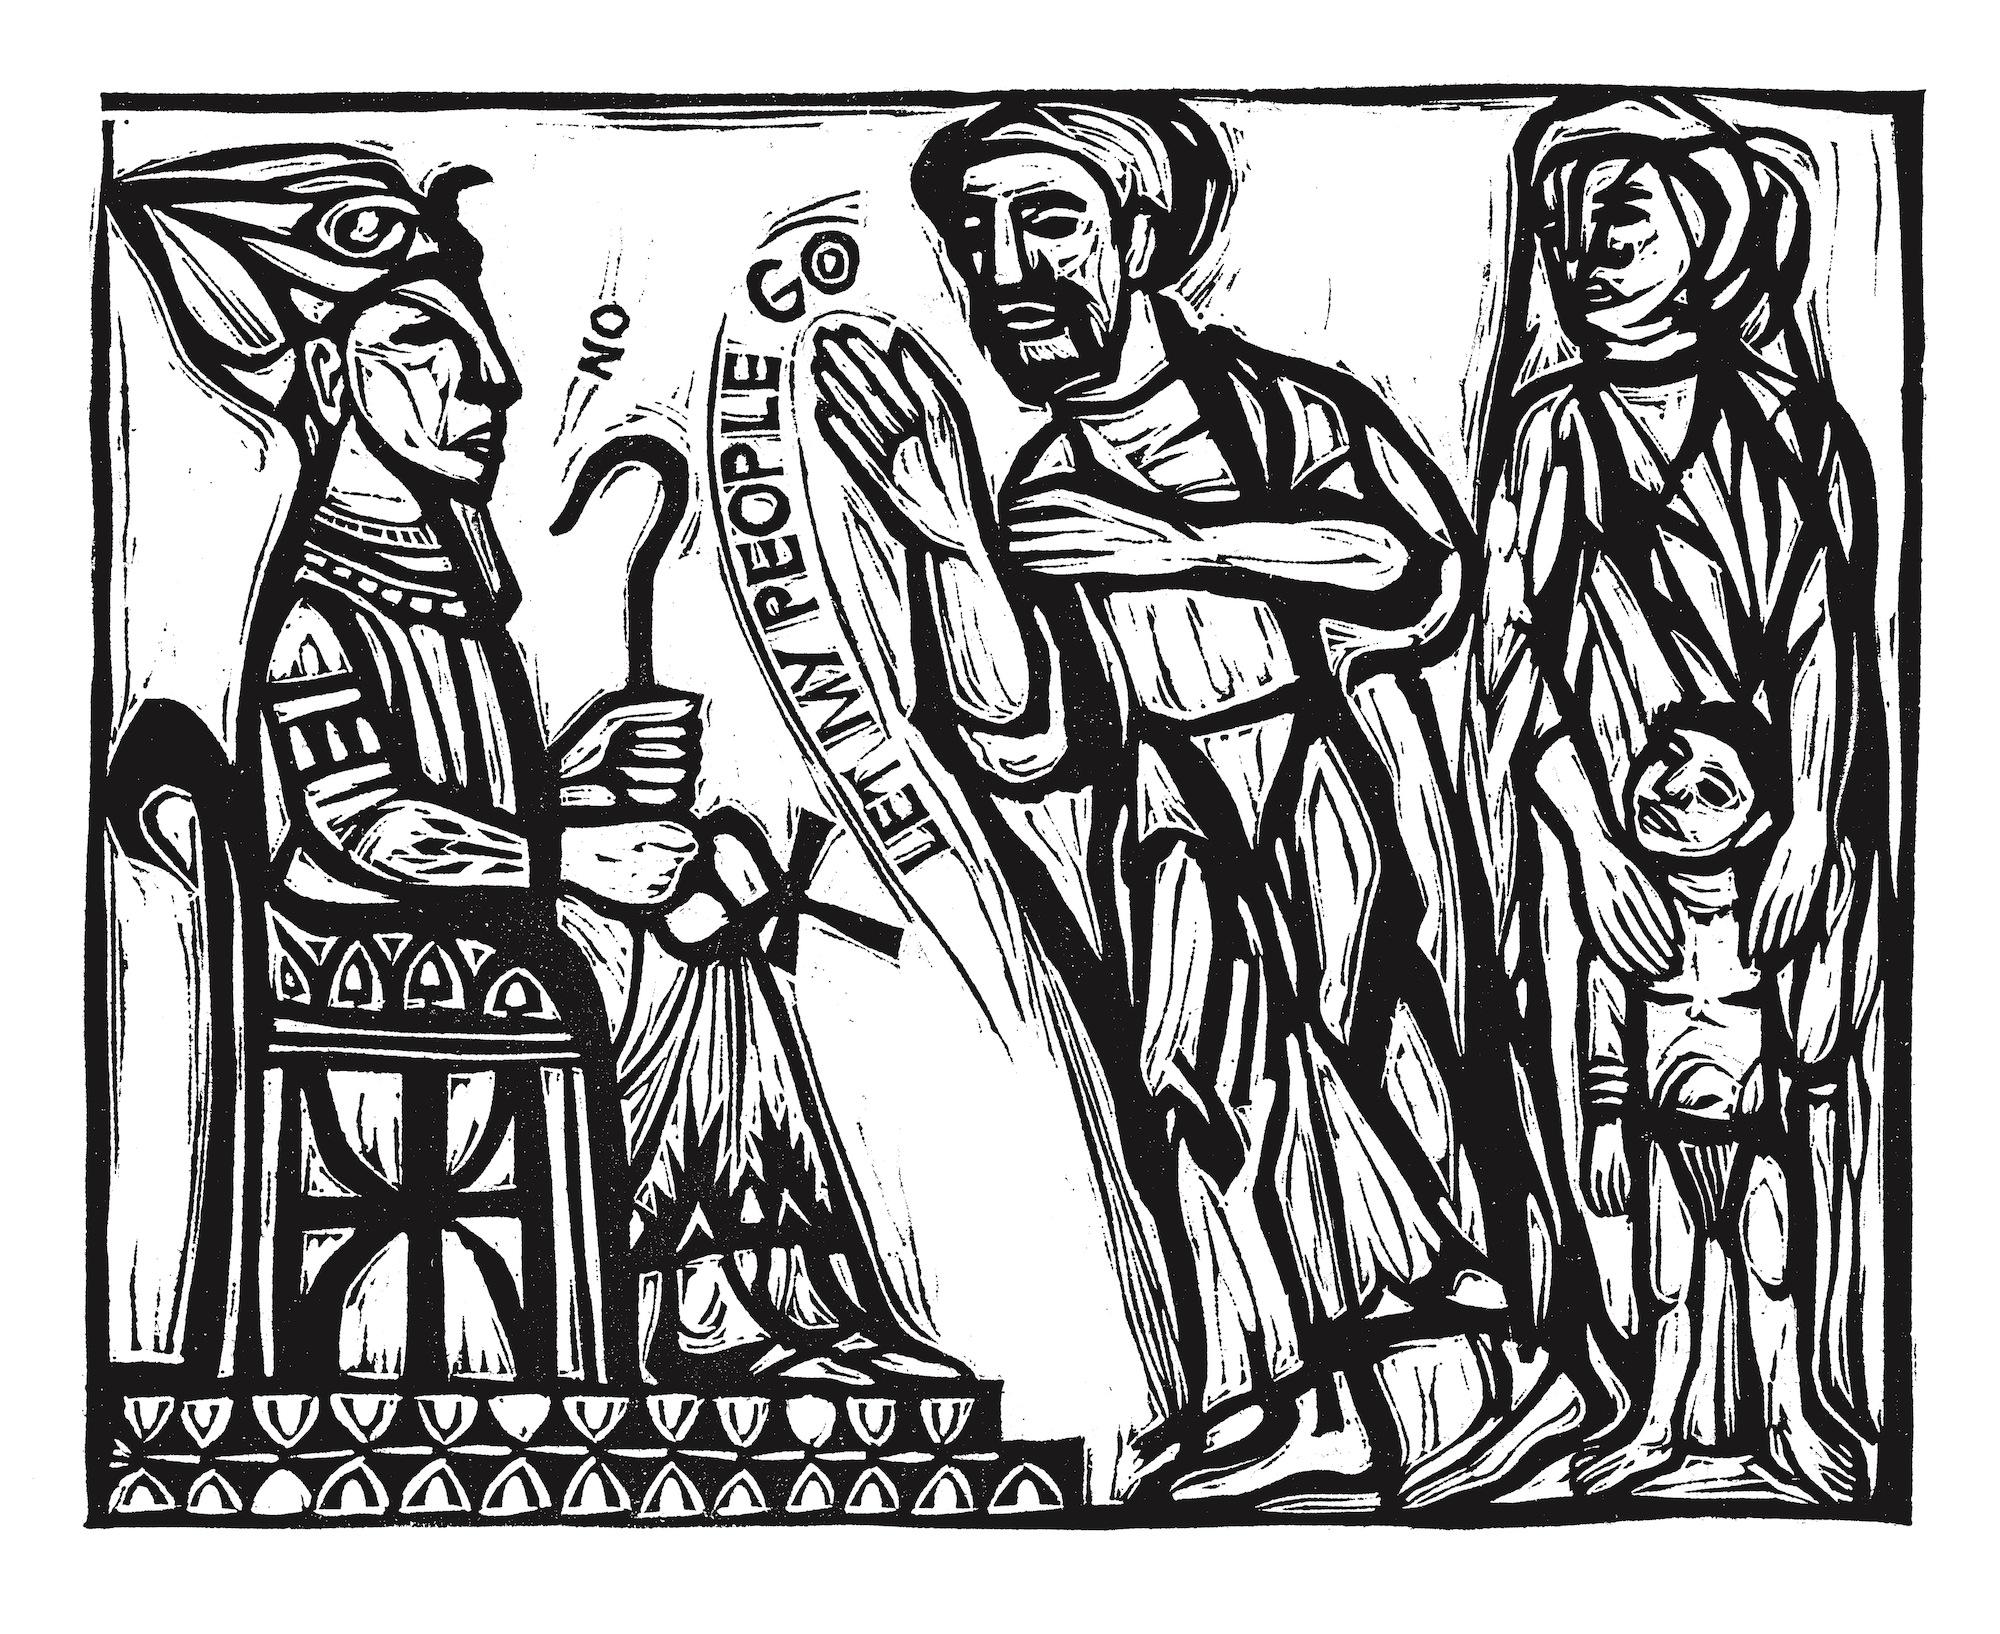 Go Down Moses,  linocut by Ashley Bryan